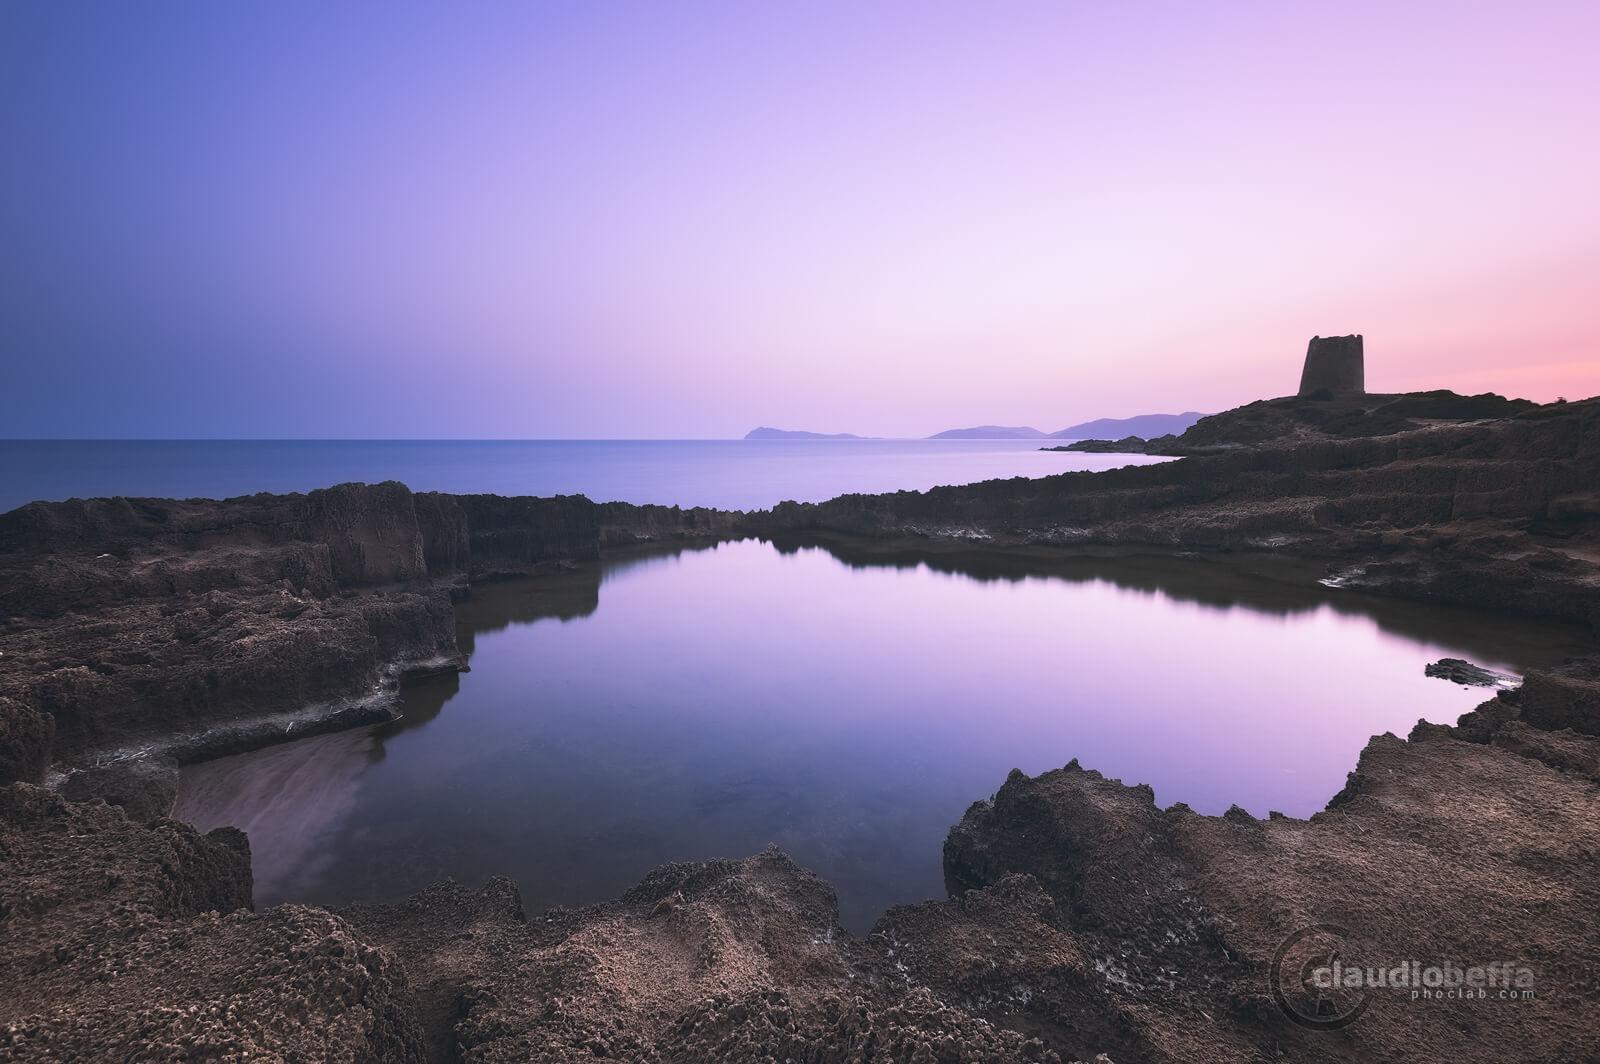 Carved pond, pond, rocks, tower, sea, reflections, sky, twilight, seascape, long exposure